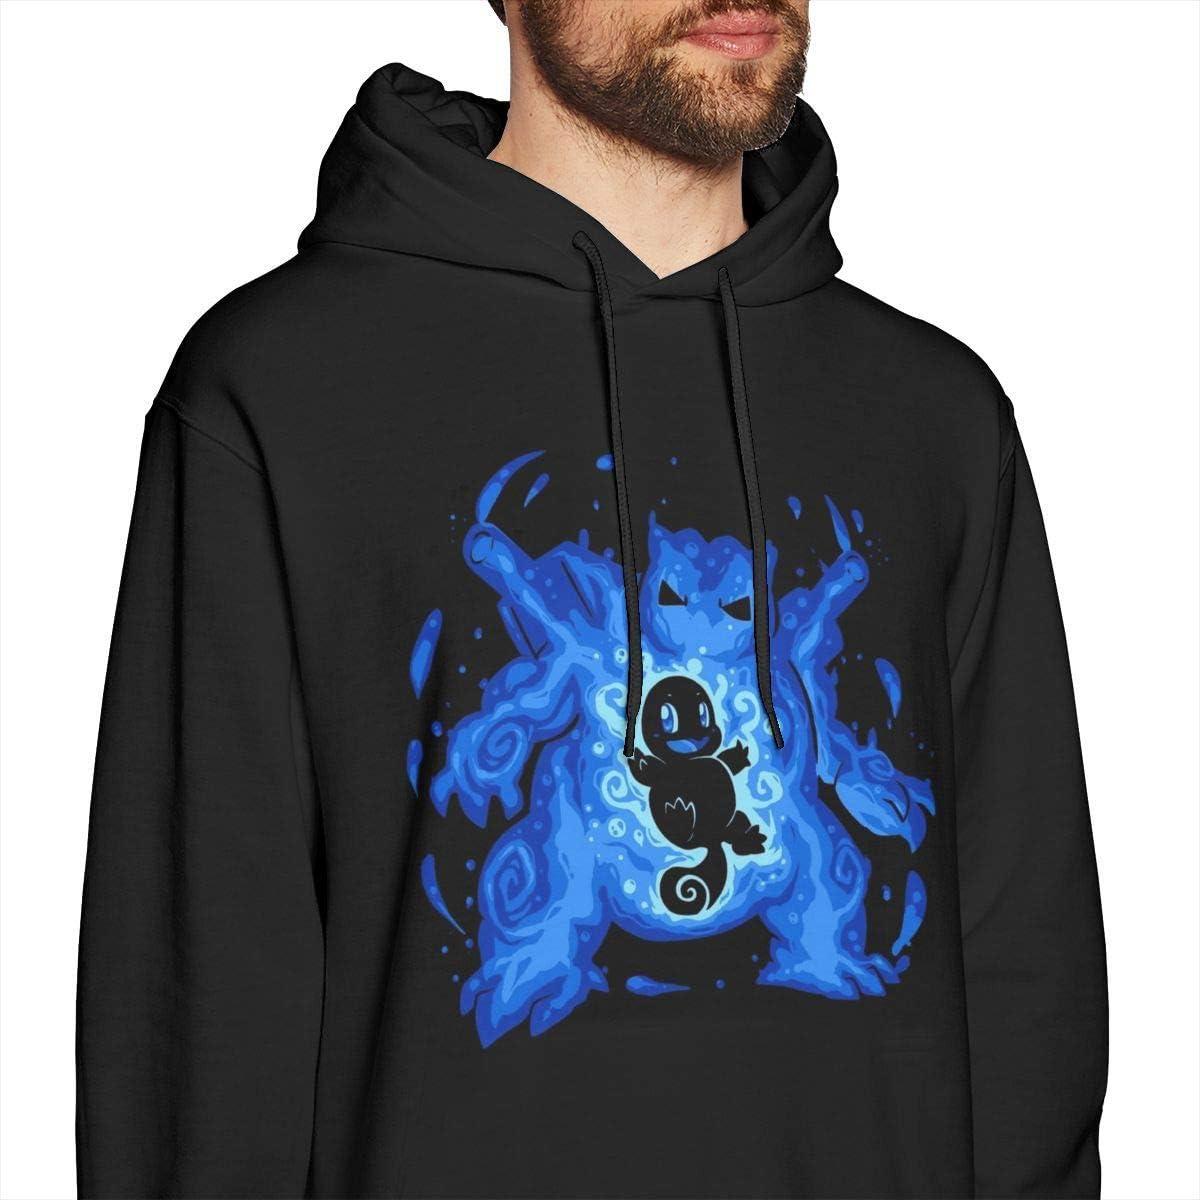 shotngwu Treecko Sceptile Grass Starter Mens Pullover Hoodies Crewneck Long Sleeve Sweatshirt Black X-large|style5